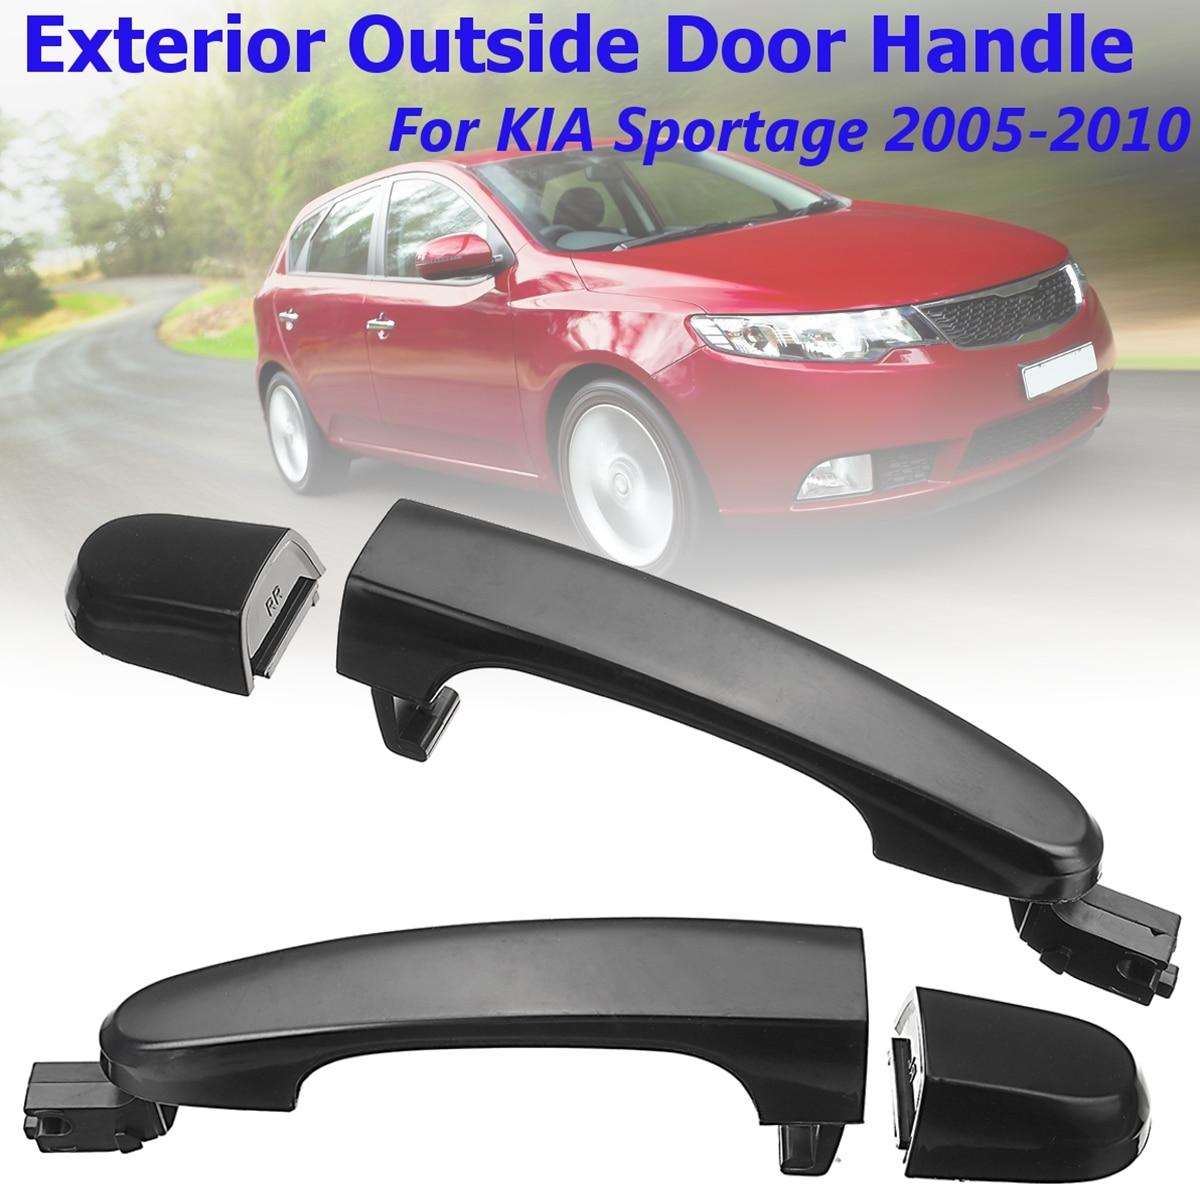 4Pcs Front Rear Left Right Exterior Door Pull Handles For KIA Sportage 05-10